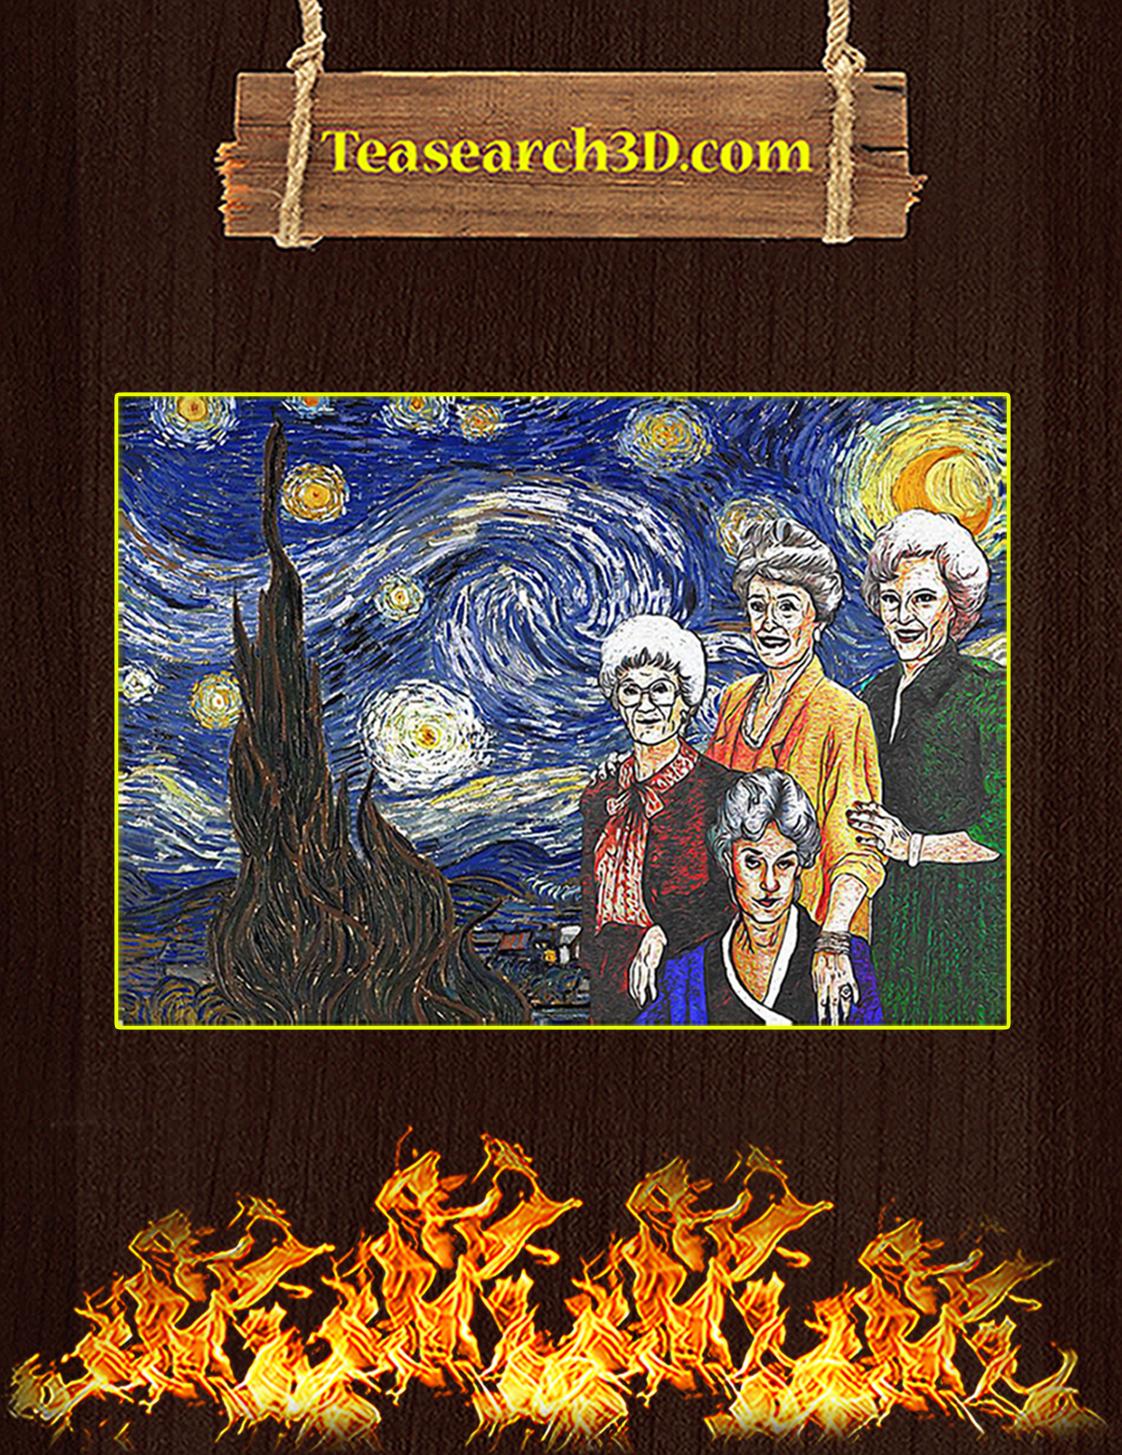 The golden girls starry night poster A3